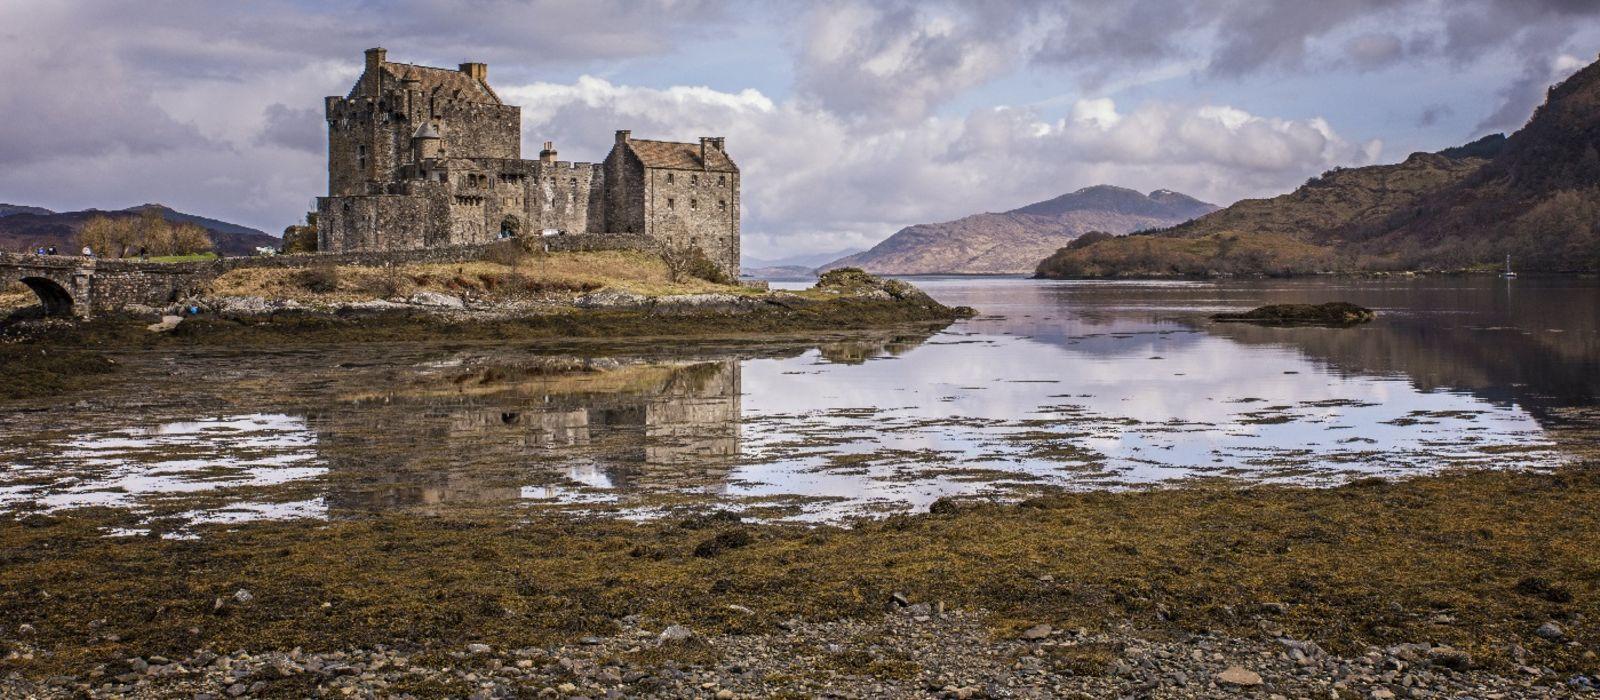 Enchanting Travels UK & Ireland Tours Eilean Donnan Castle in Kyle of Lochalsh Scotland